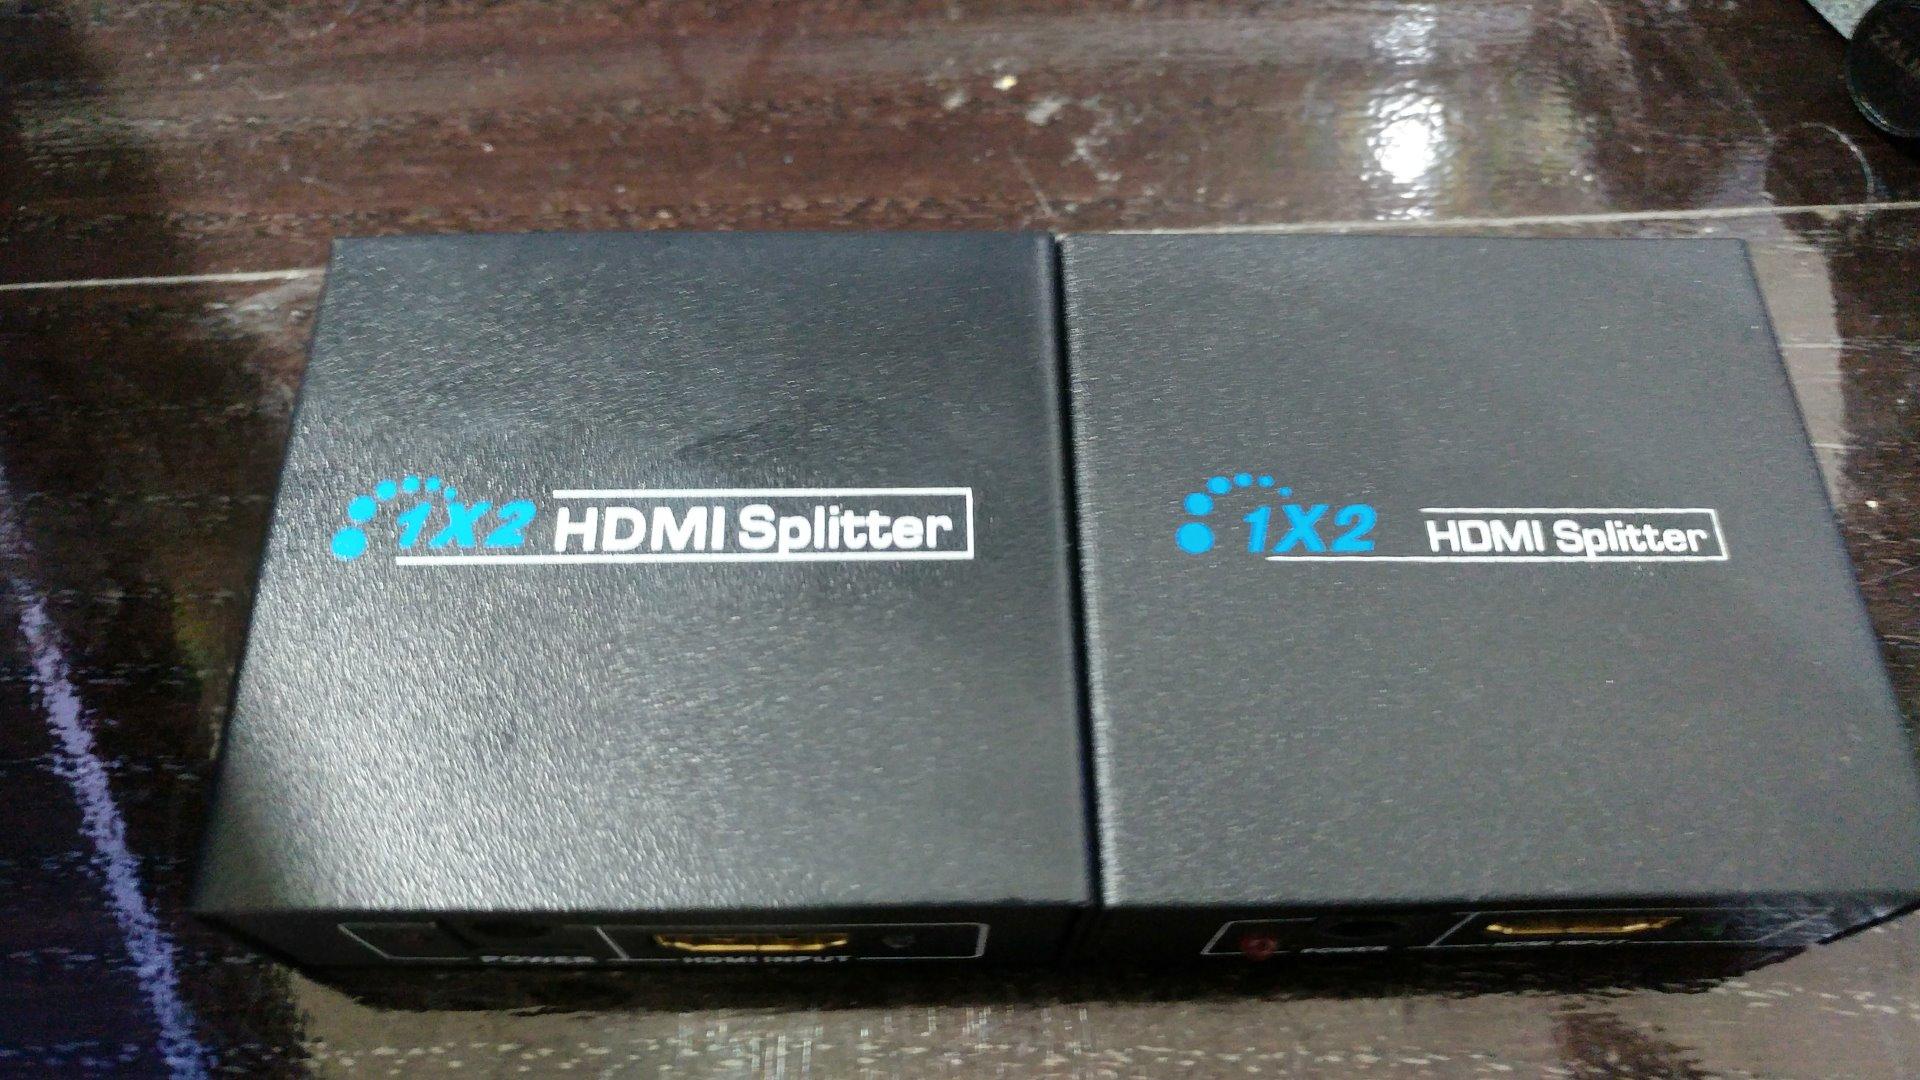 1 to 2 HDMI Splitter的上蓋差別